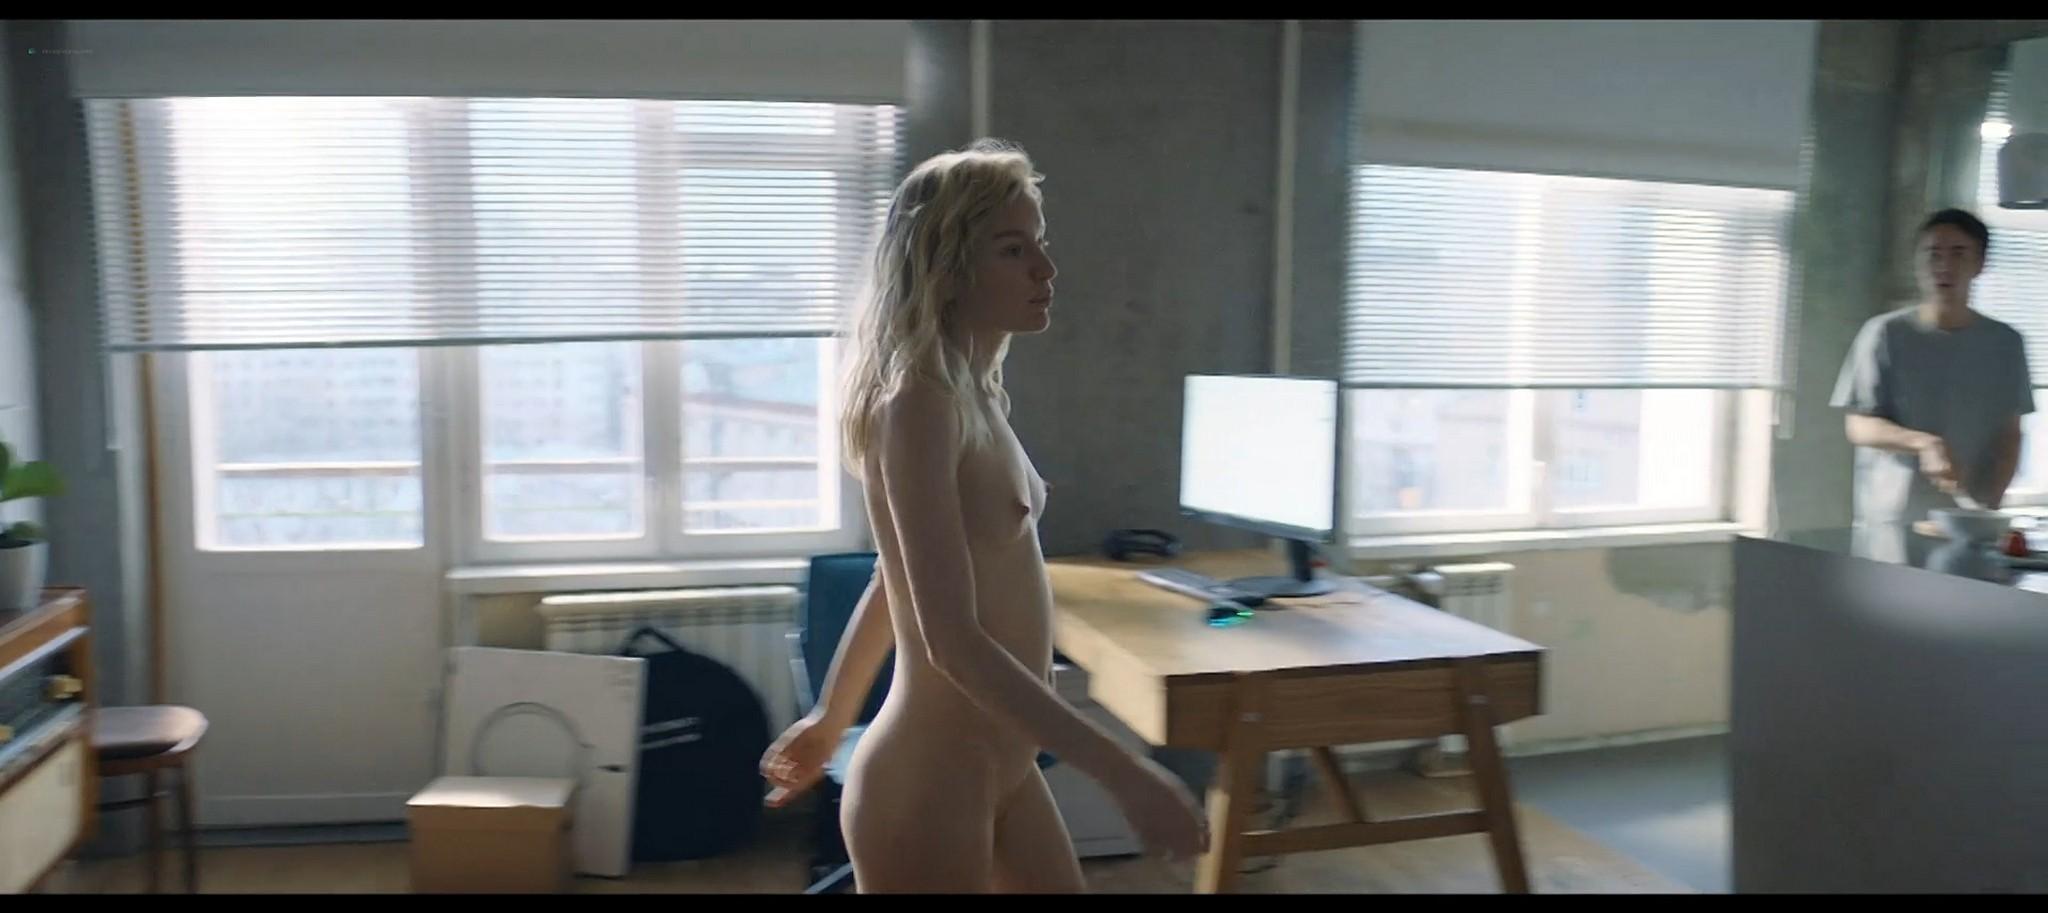 Lena Tronina nude and hot sex Happy End RU 2021 S1e3 4 1080p Web 4